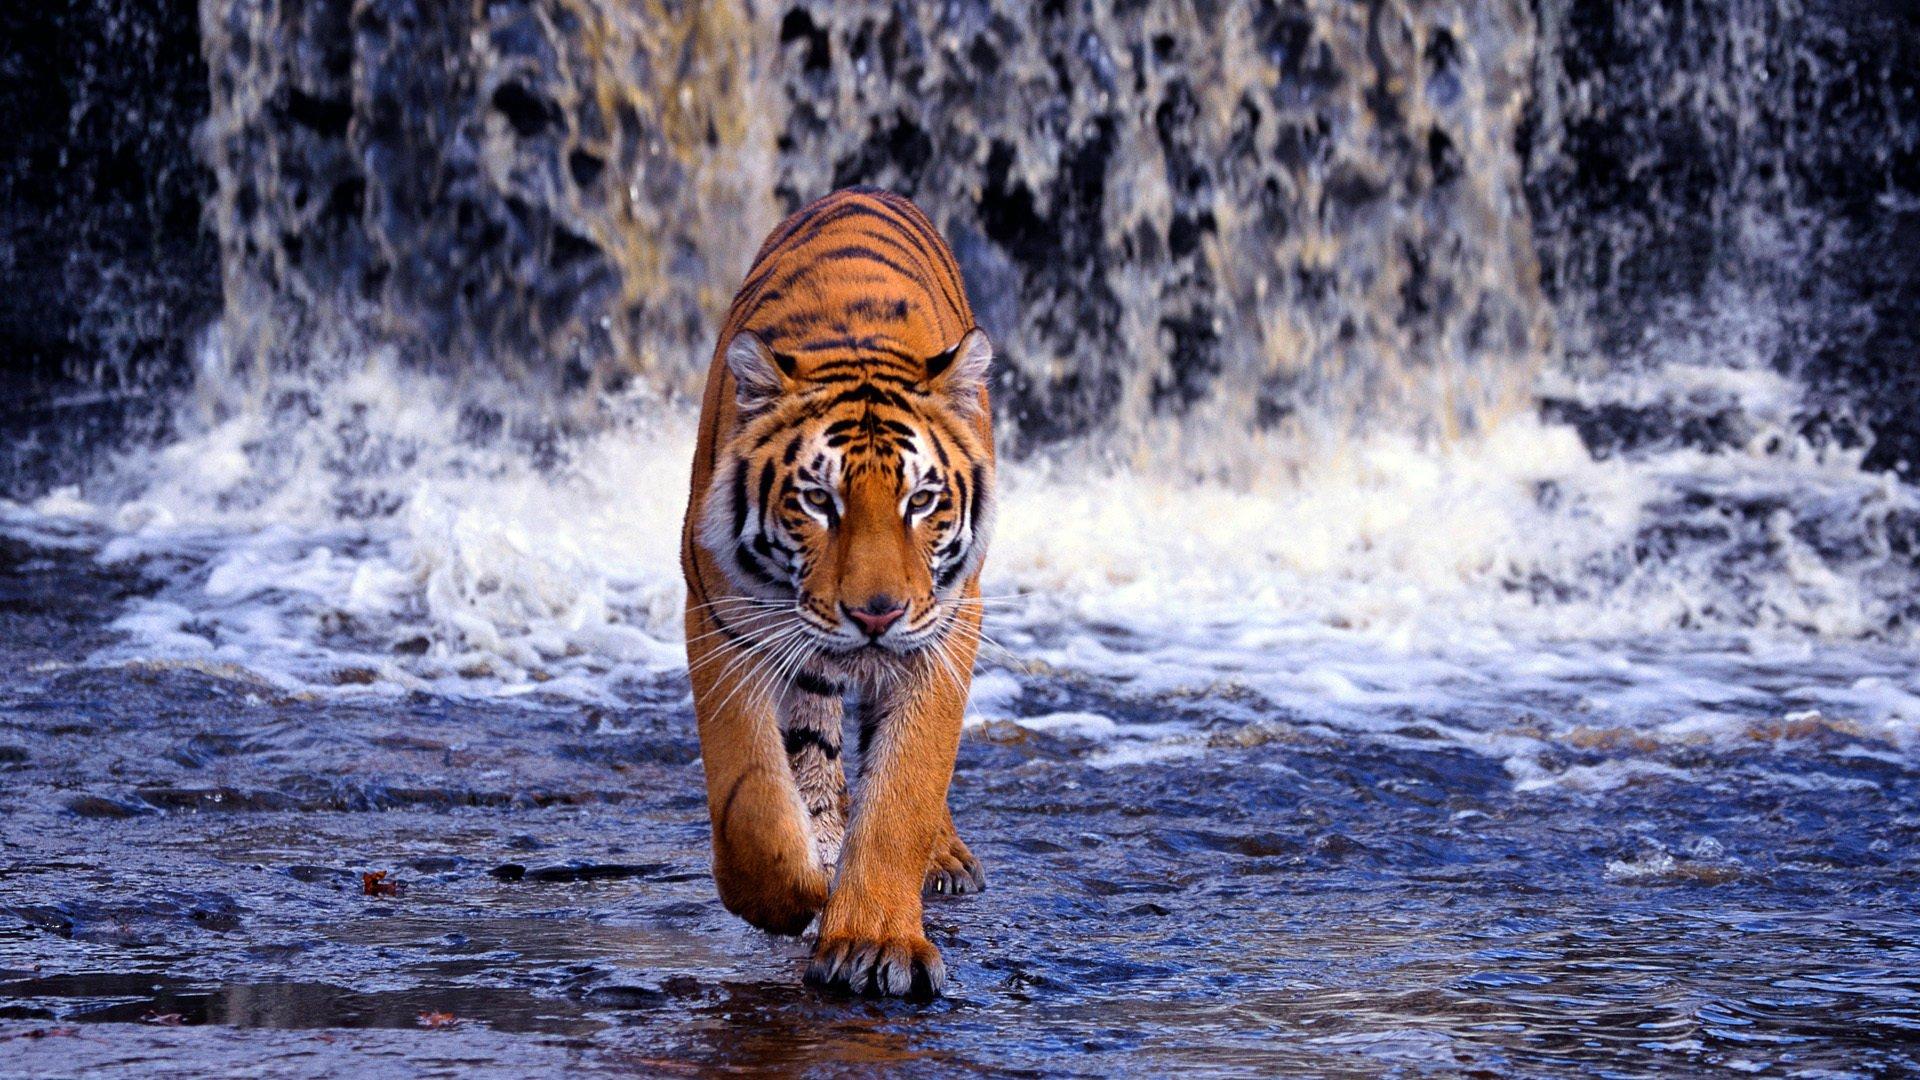 tiger wallpaper hd sf